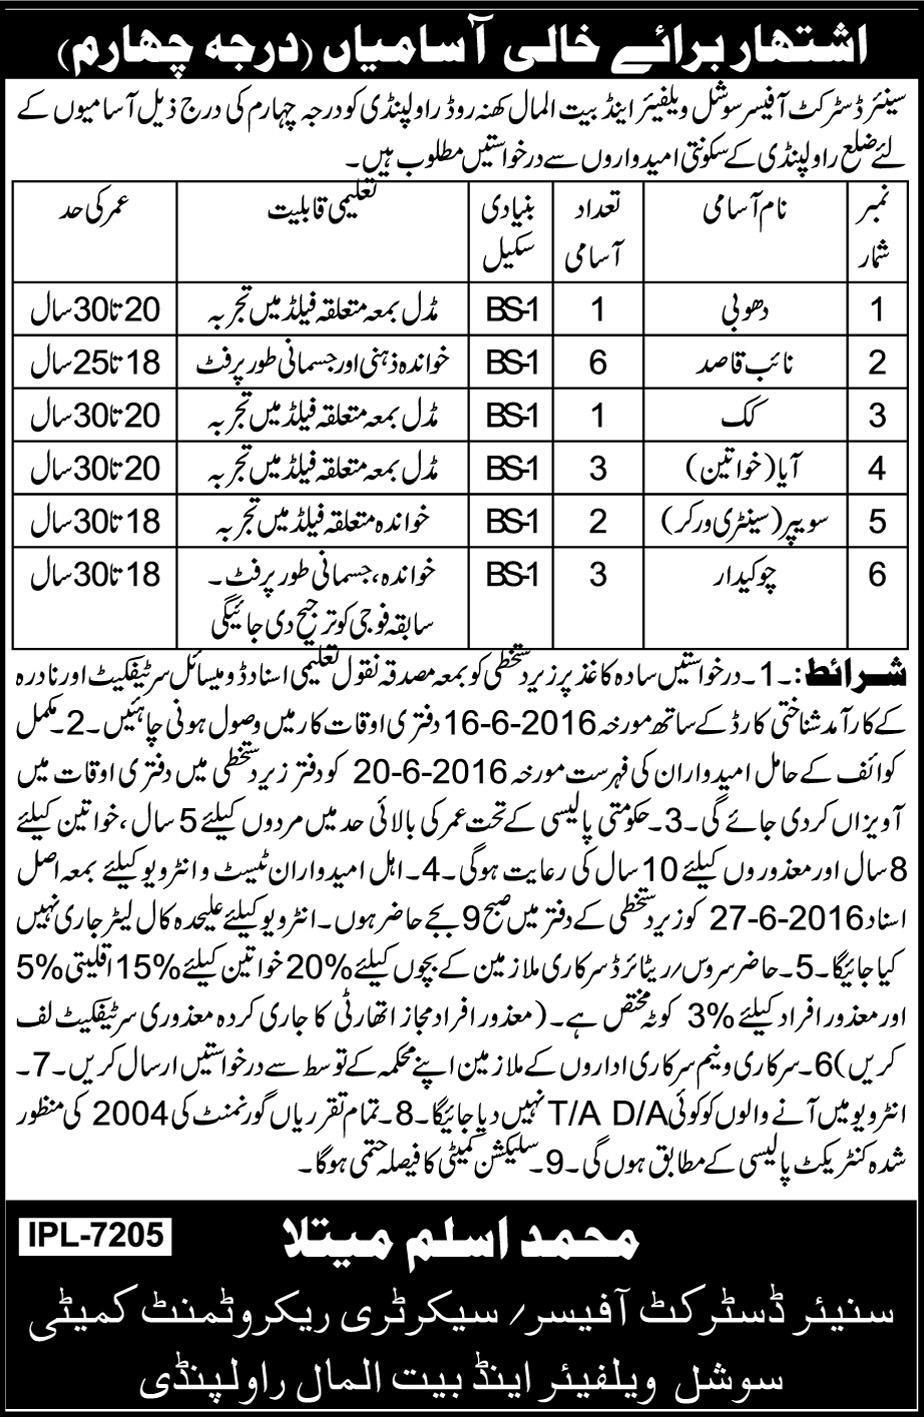 Social Welfare and Baitulmaal Department Rawalpindi Basic Scale Jobs